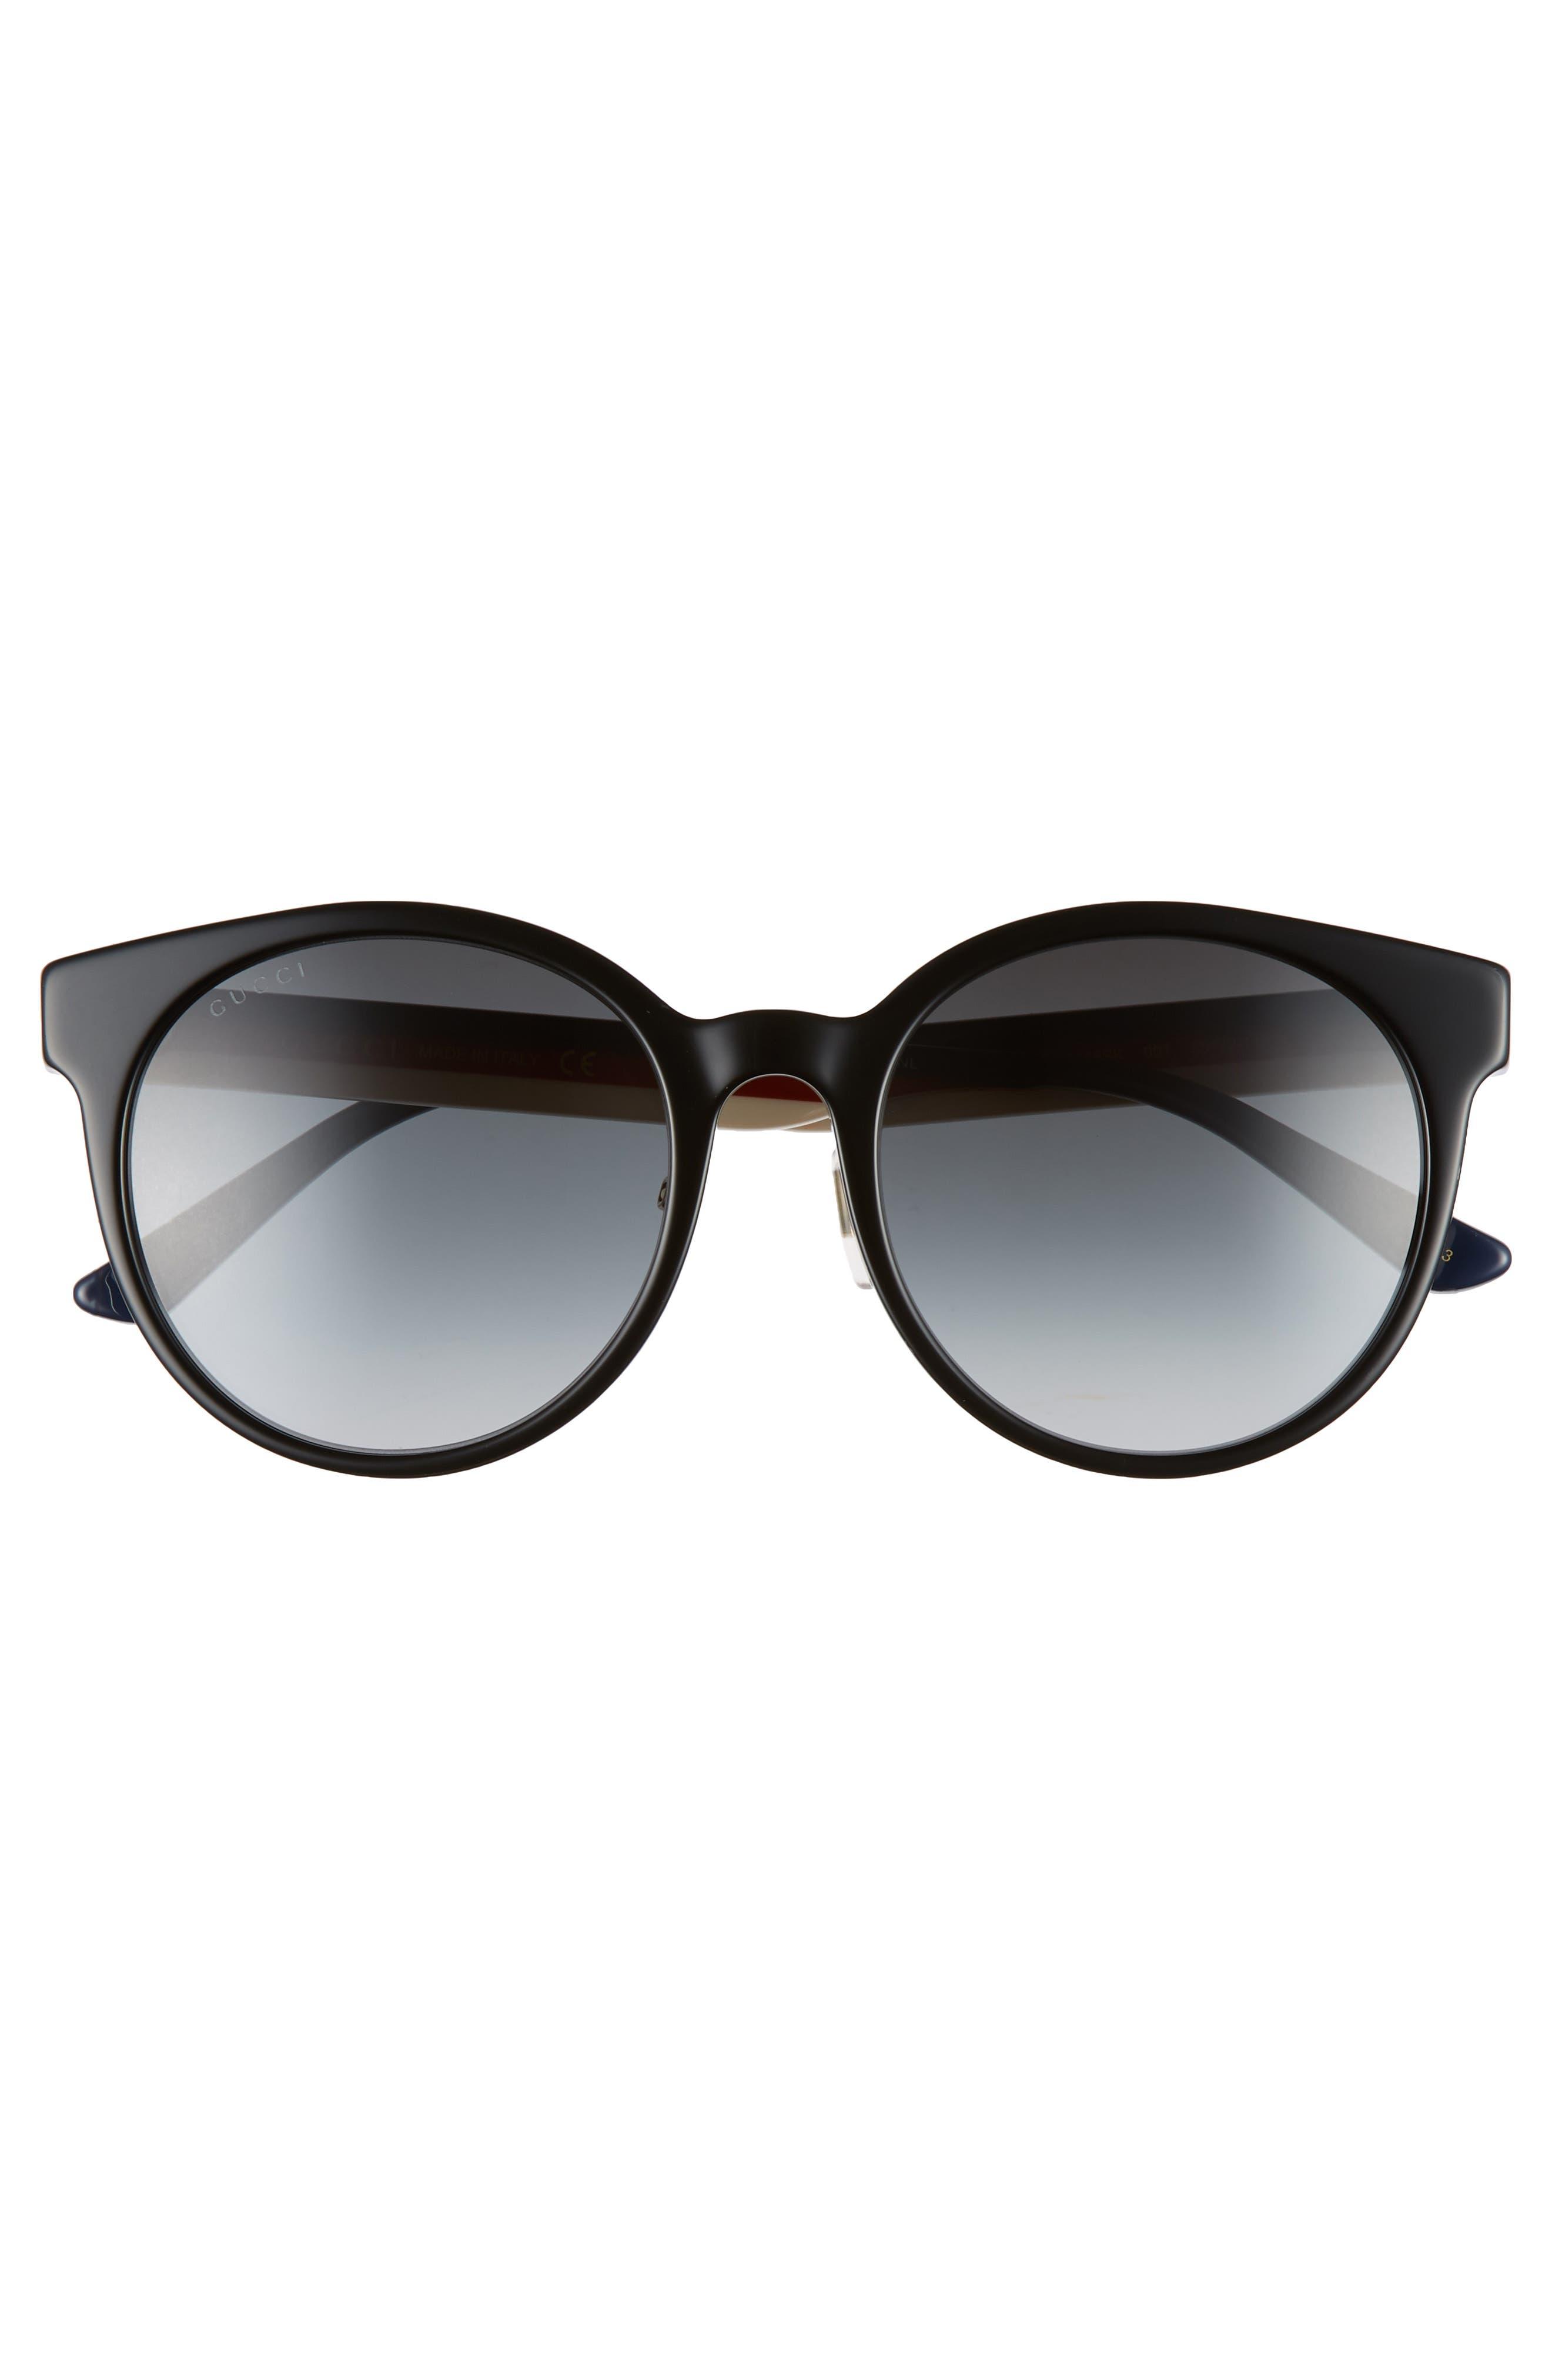 GUCCI, 55mm Round Sunglasses, Alternate thumbnail 3, color, BLACK/ MULTI/ GREY GRADIENT